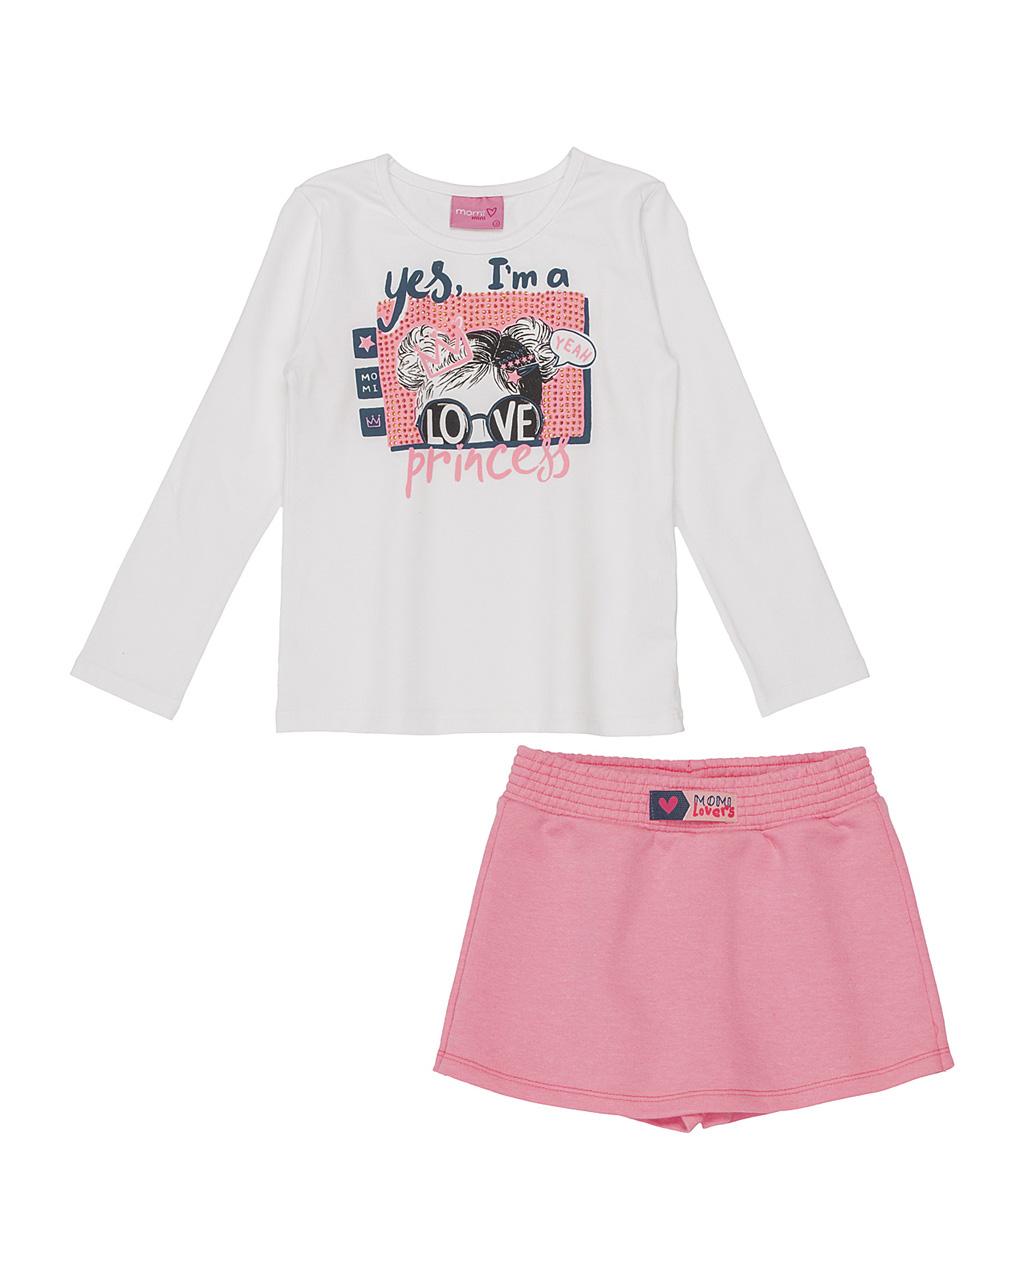 Conjunto Infantil Blusa Princess com Shorts Saia Rosa Neon Momi